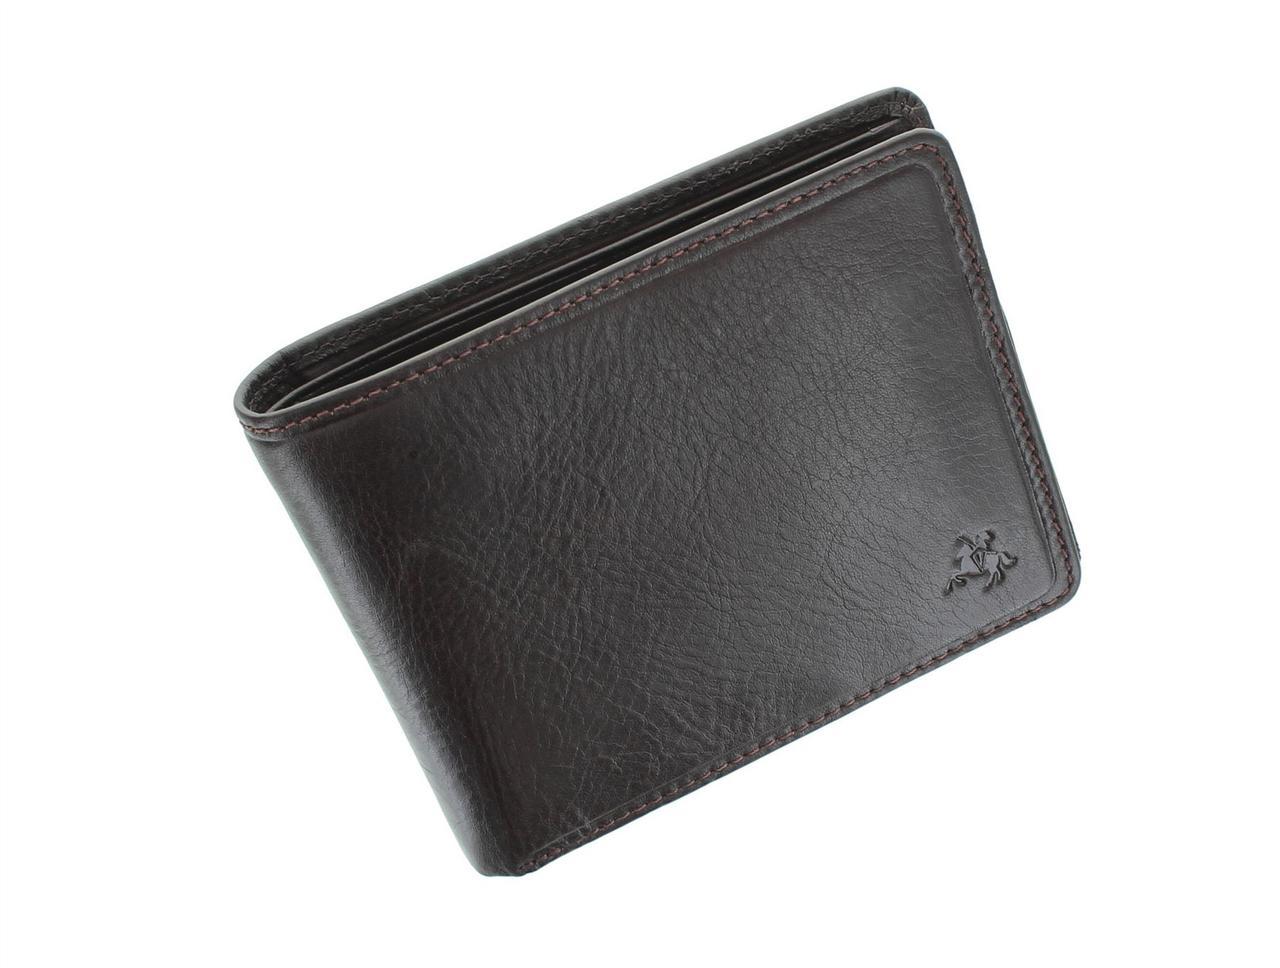 Качественное портмоне без застежки Visconti TSC46 Brown (Великобритания)